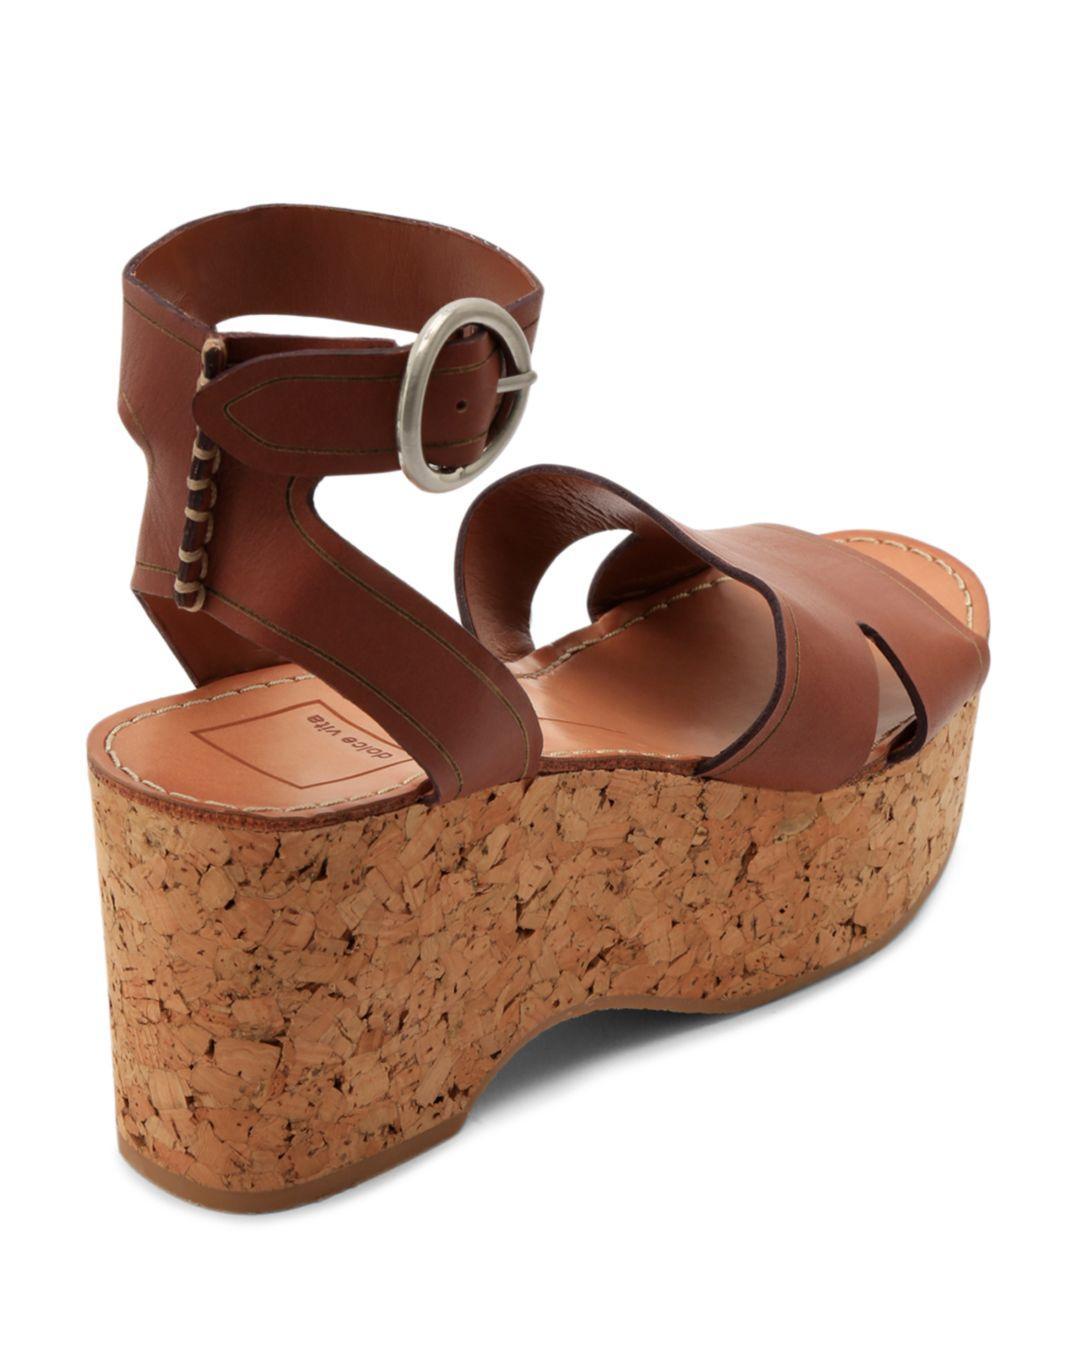 99c281df3e5a Dolce Vita - Brown Women s Linda Leather   Cork Platform Sandals - Lyst.  View fullscreen